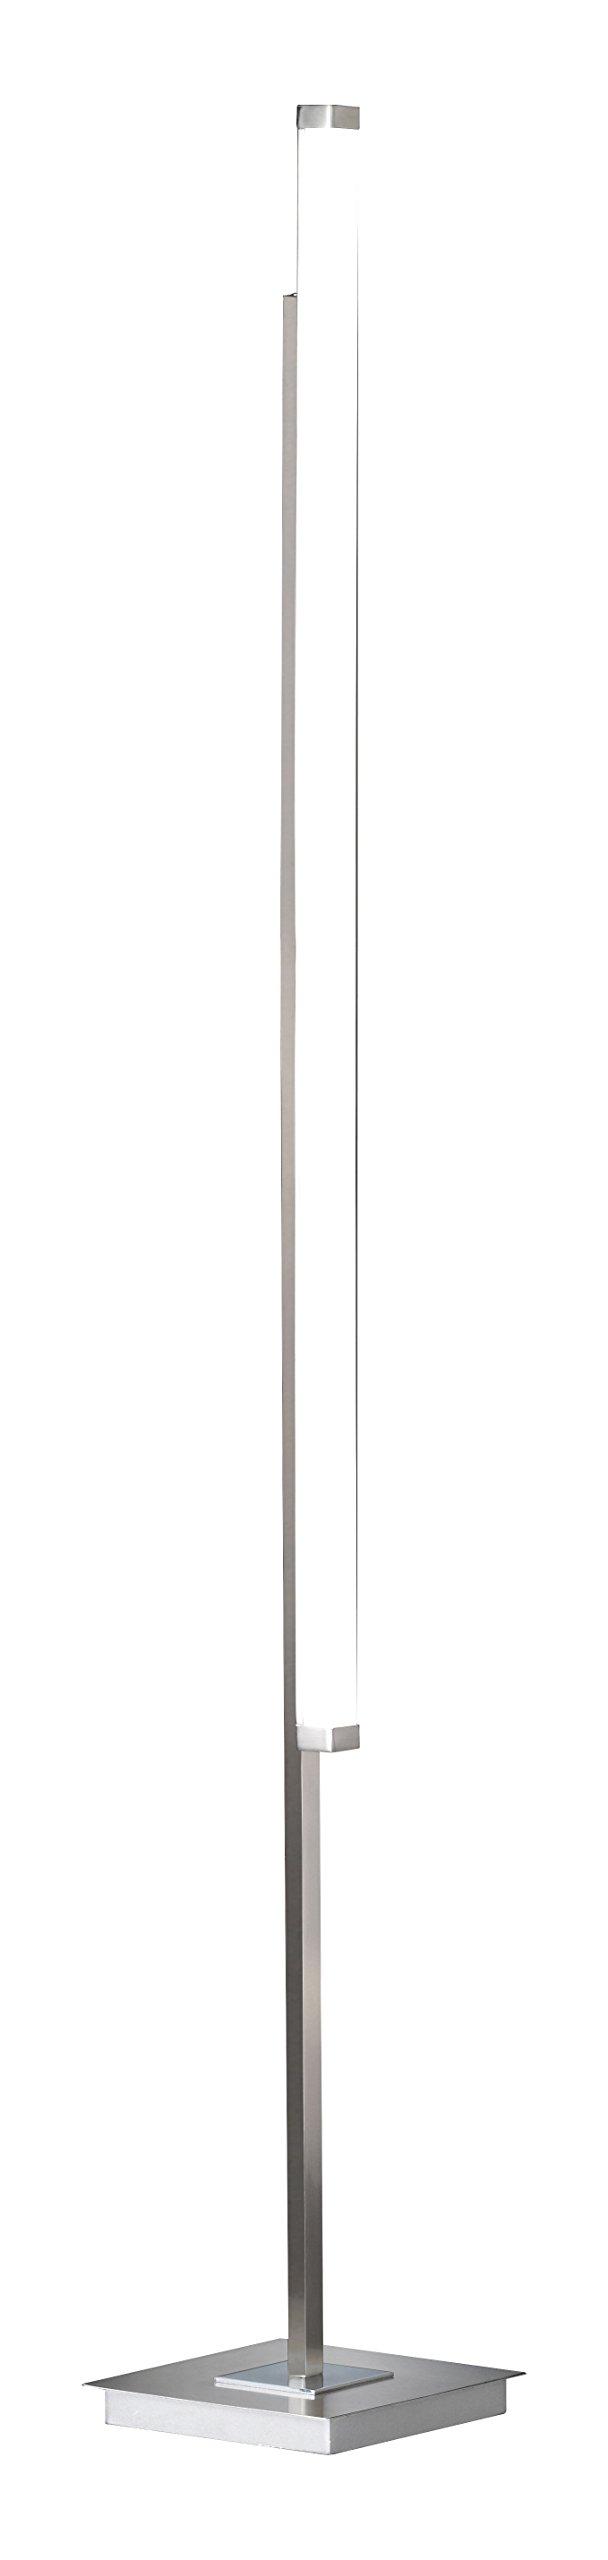 Argento H: 186 cm x B: 62 cm x L: 52 cm 36 W WOFI Piantana Integriert